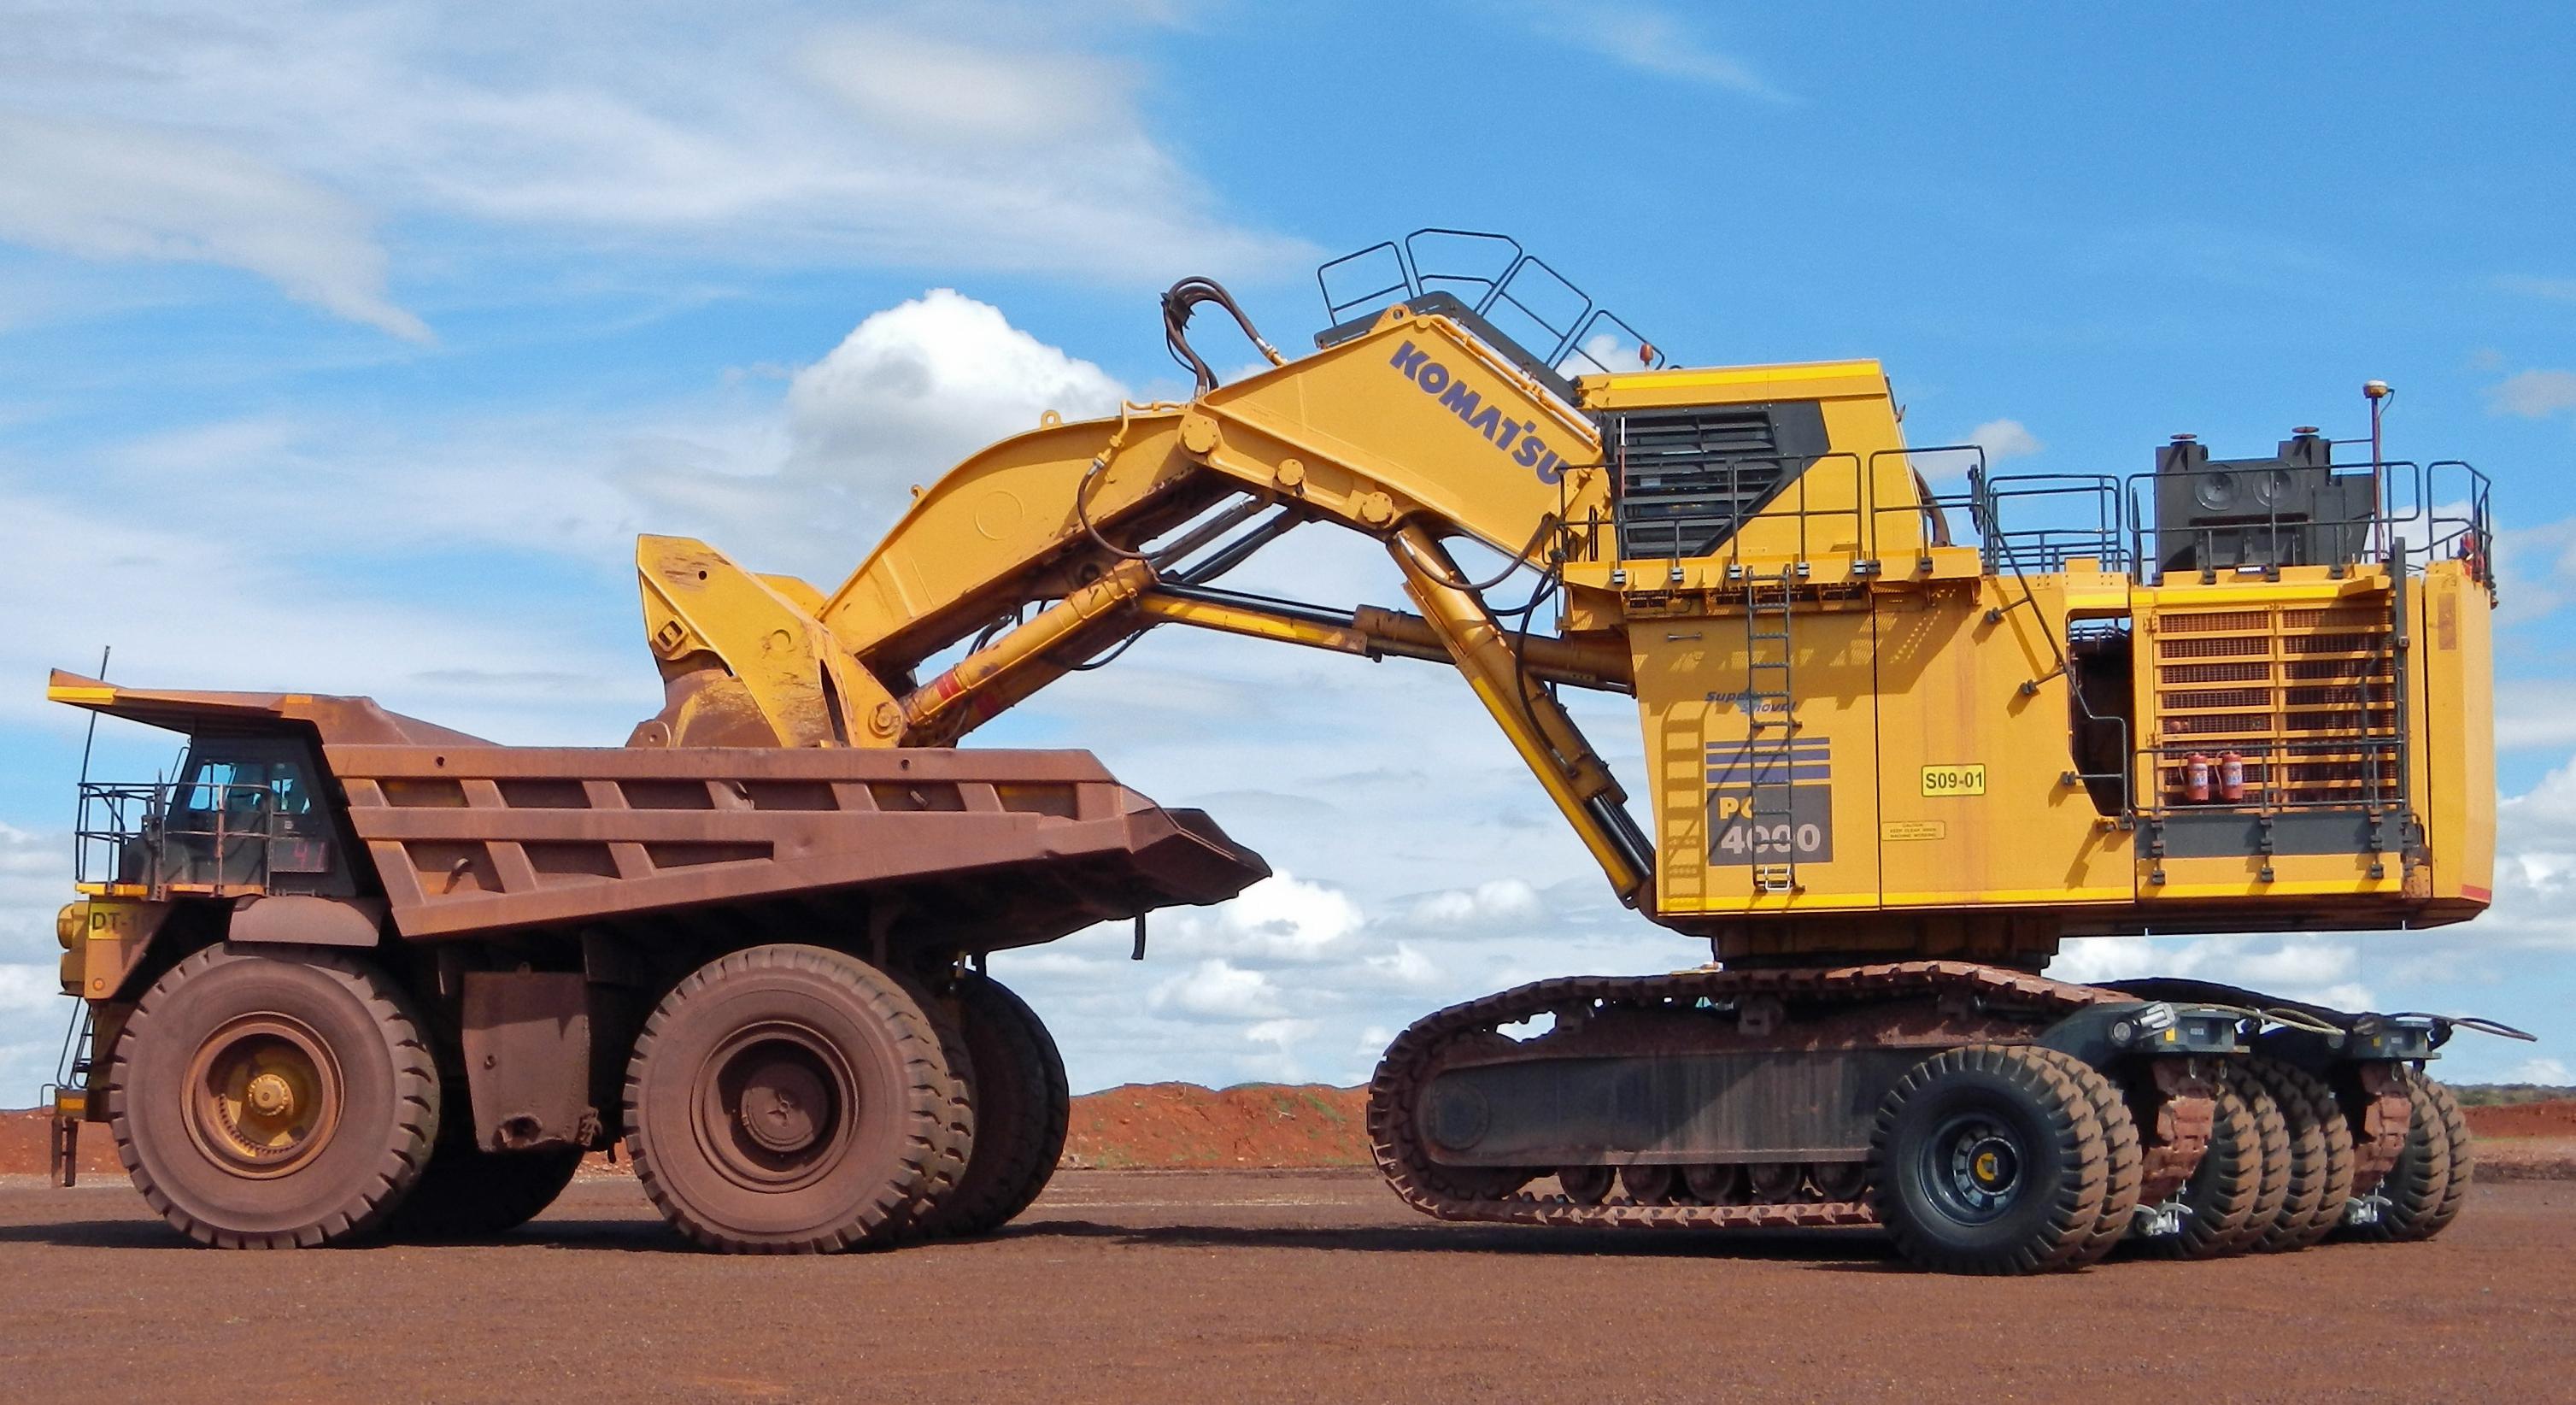 Komatsu pc4000 excavator dump truck hd wallpaper background image 3015x1644 id 932791 - Mining images hd ...